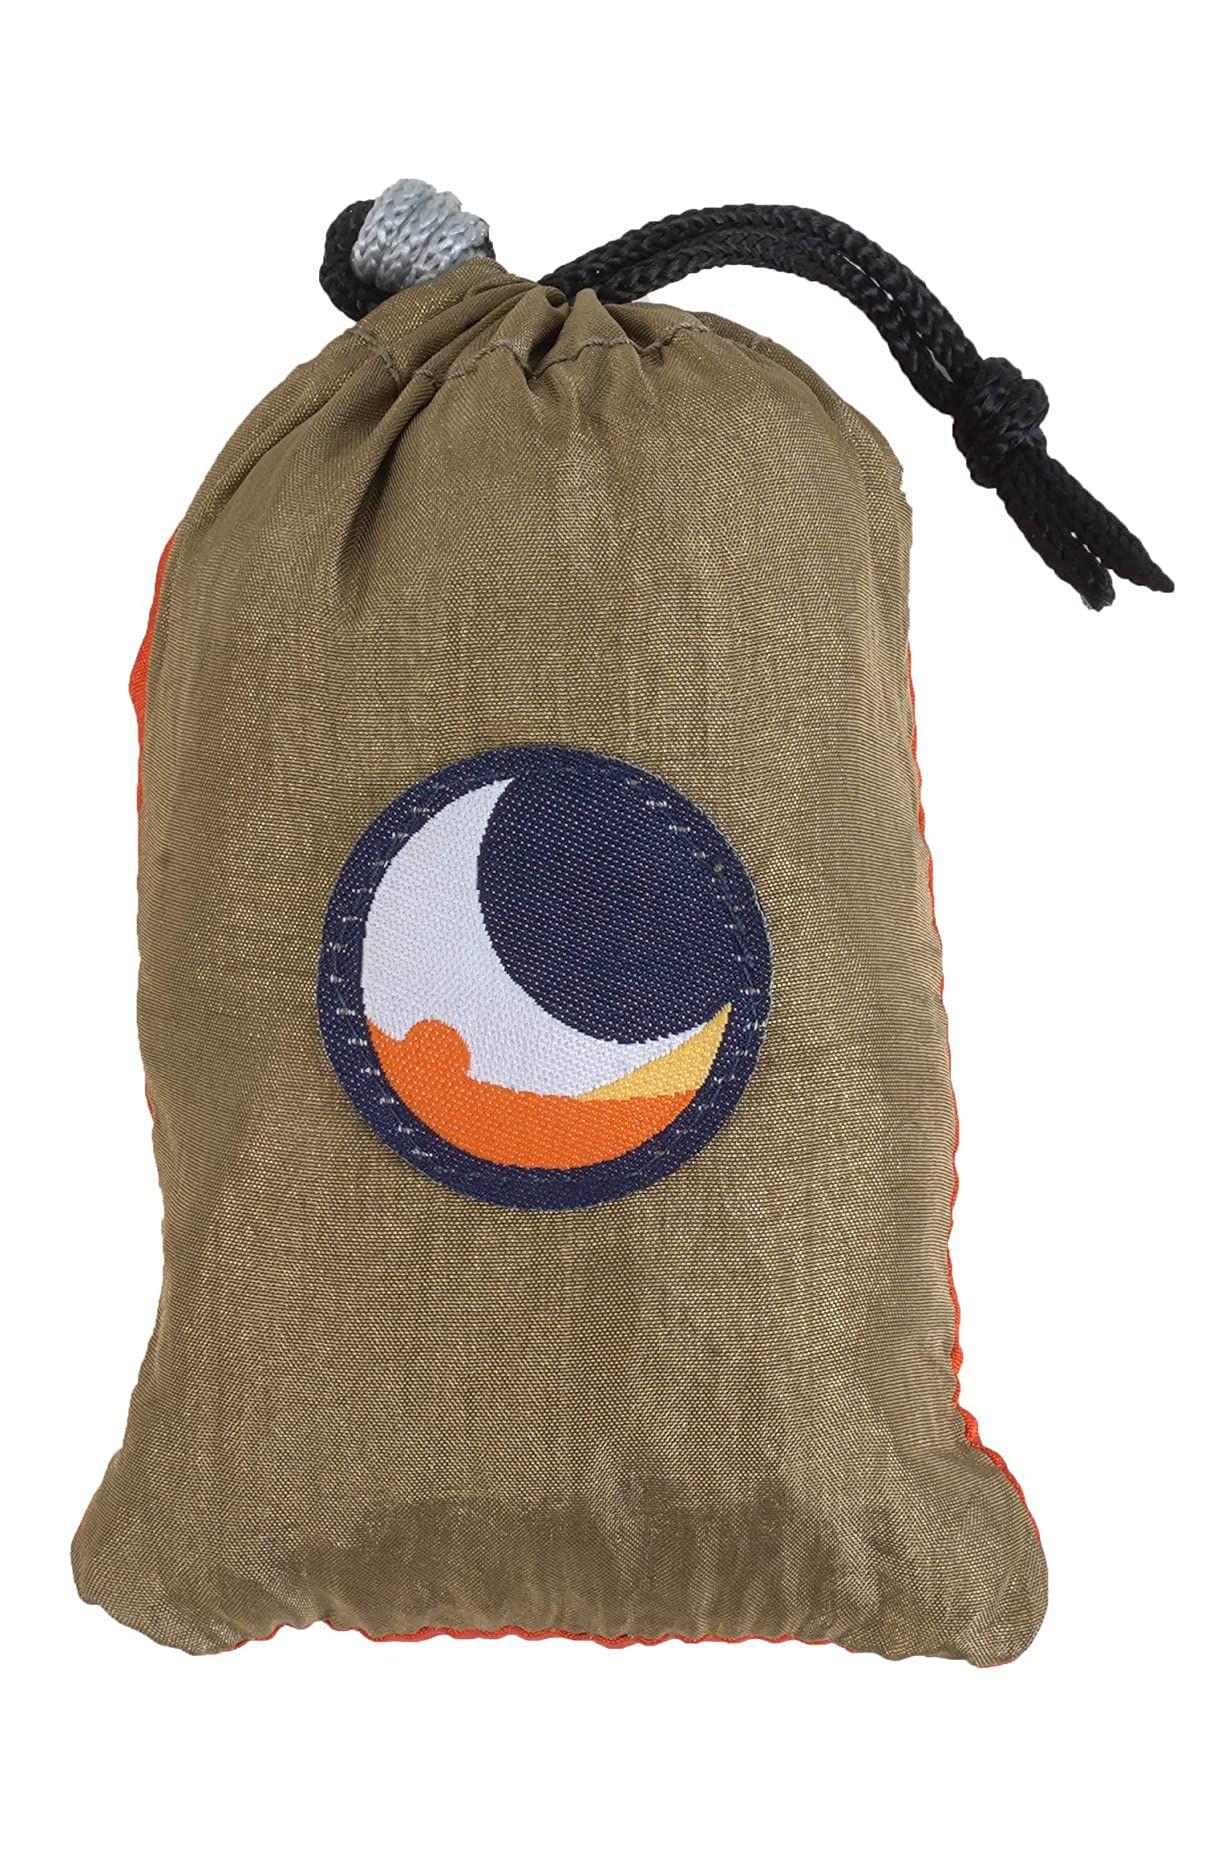 Saco Ticket To The Moon ECO BAG LARGE Brown/Orange